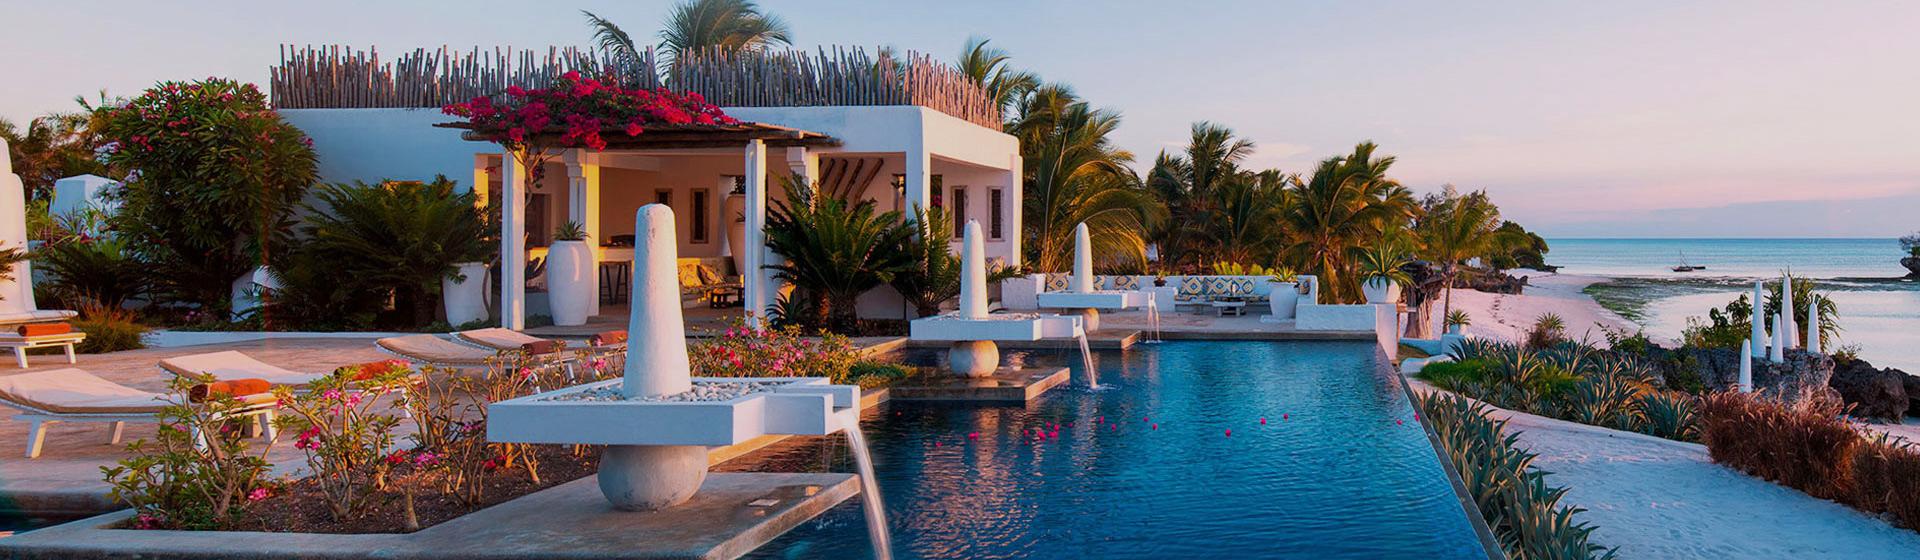 East Africa Hotels